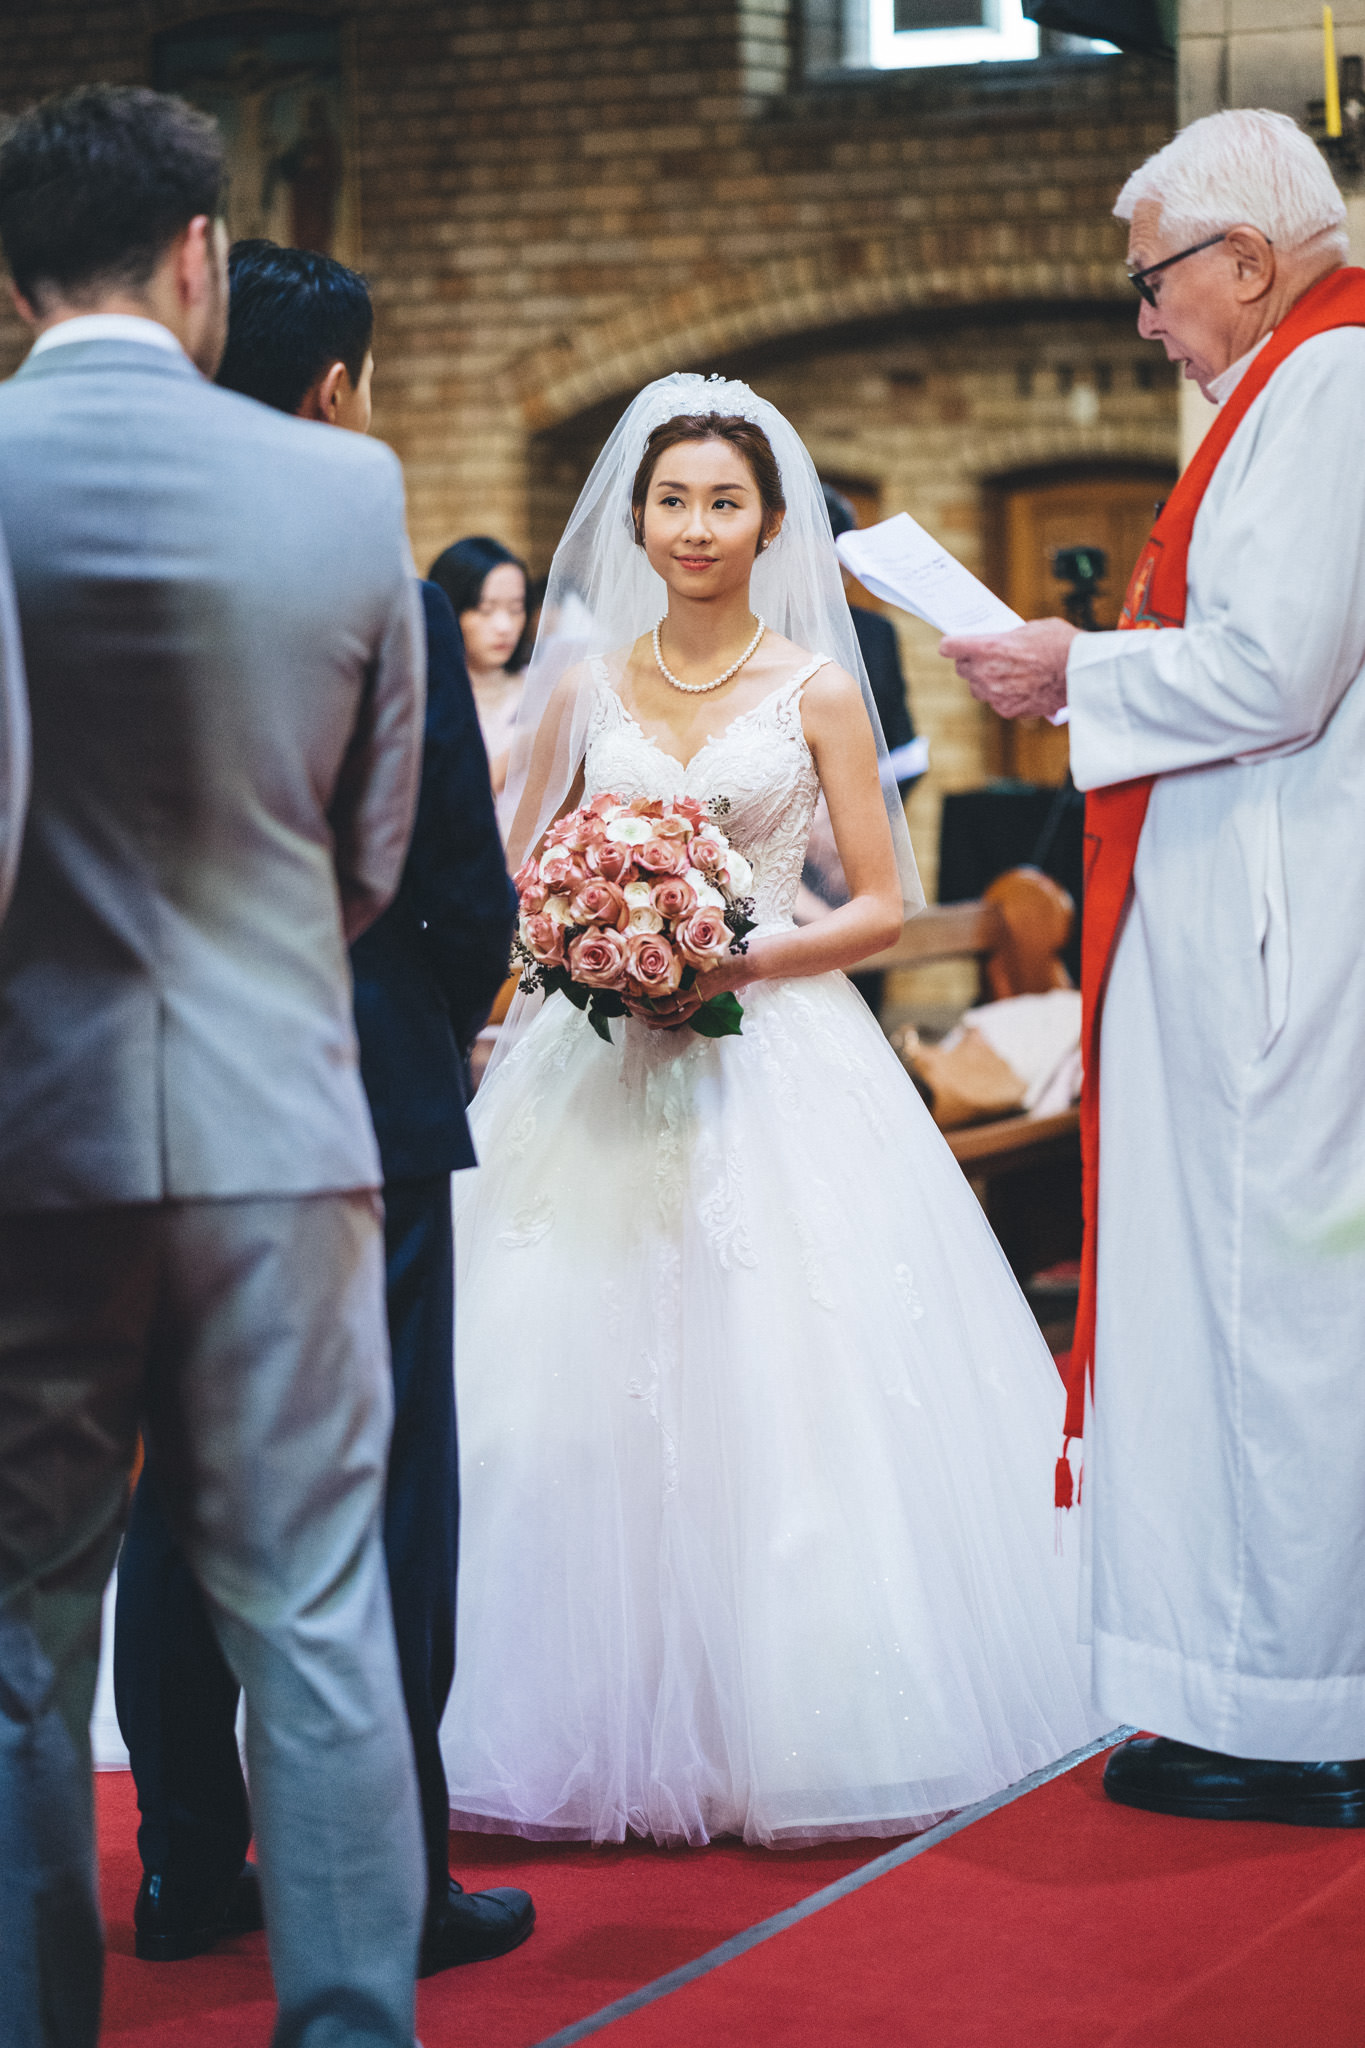 Ann-Marie-Yuen-Photography0043.jpg